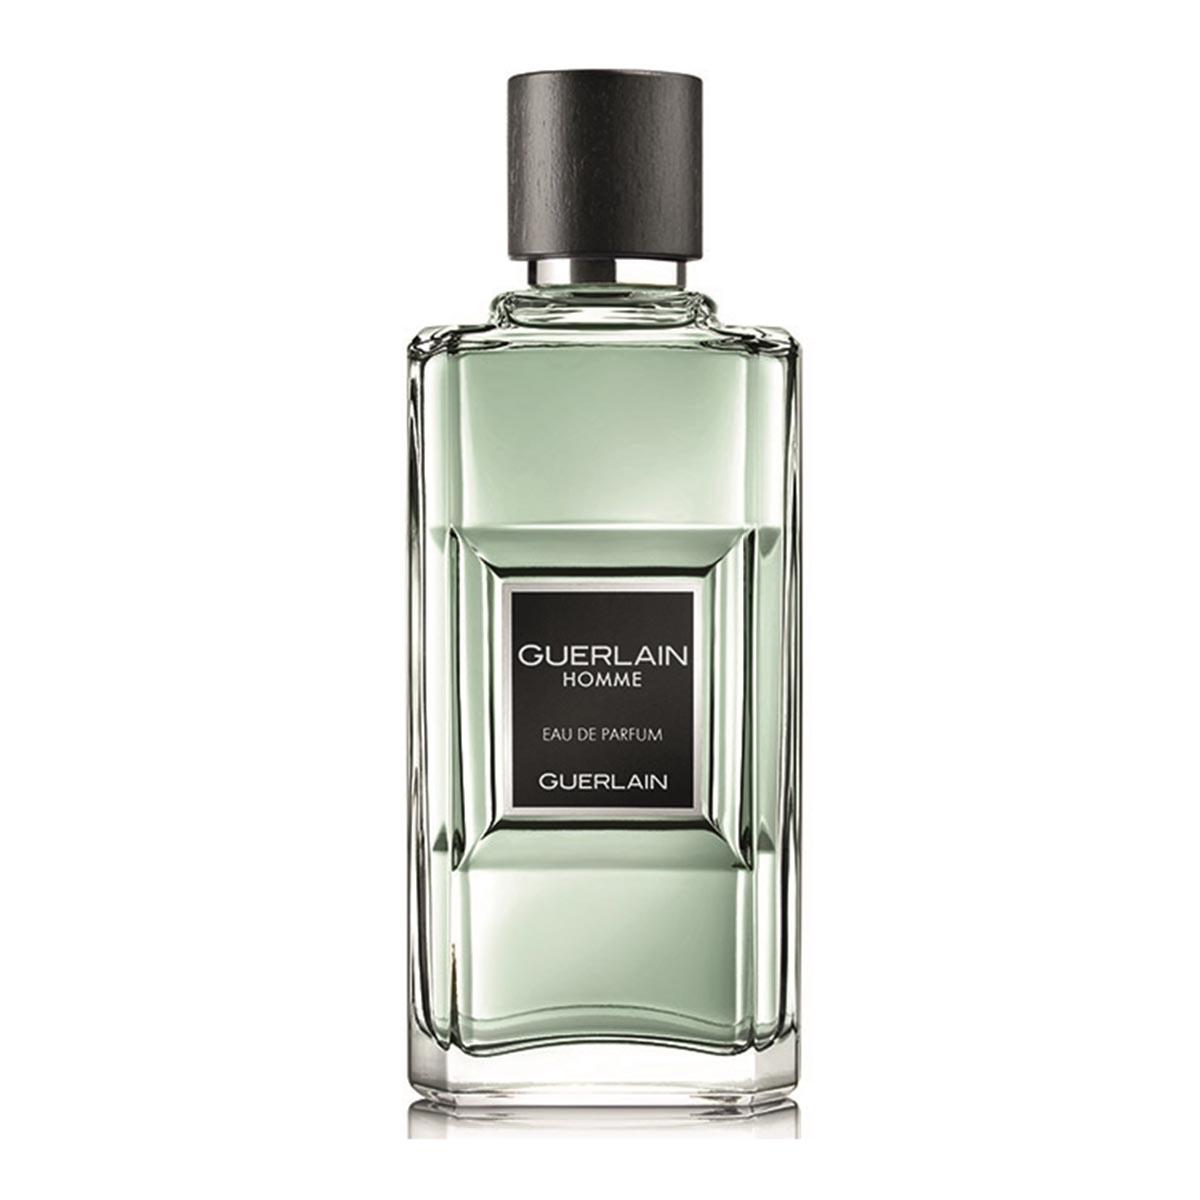 Guerlain homme eau de parfum 100ml vaporizador